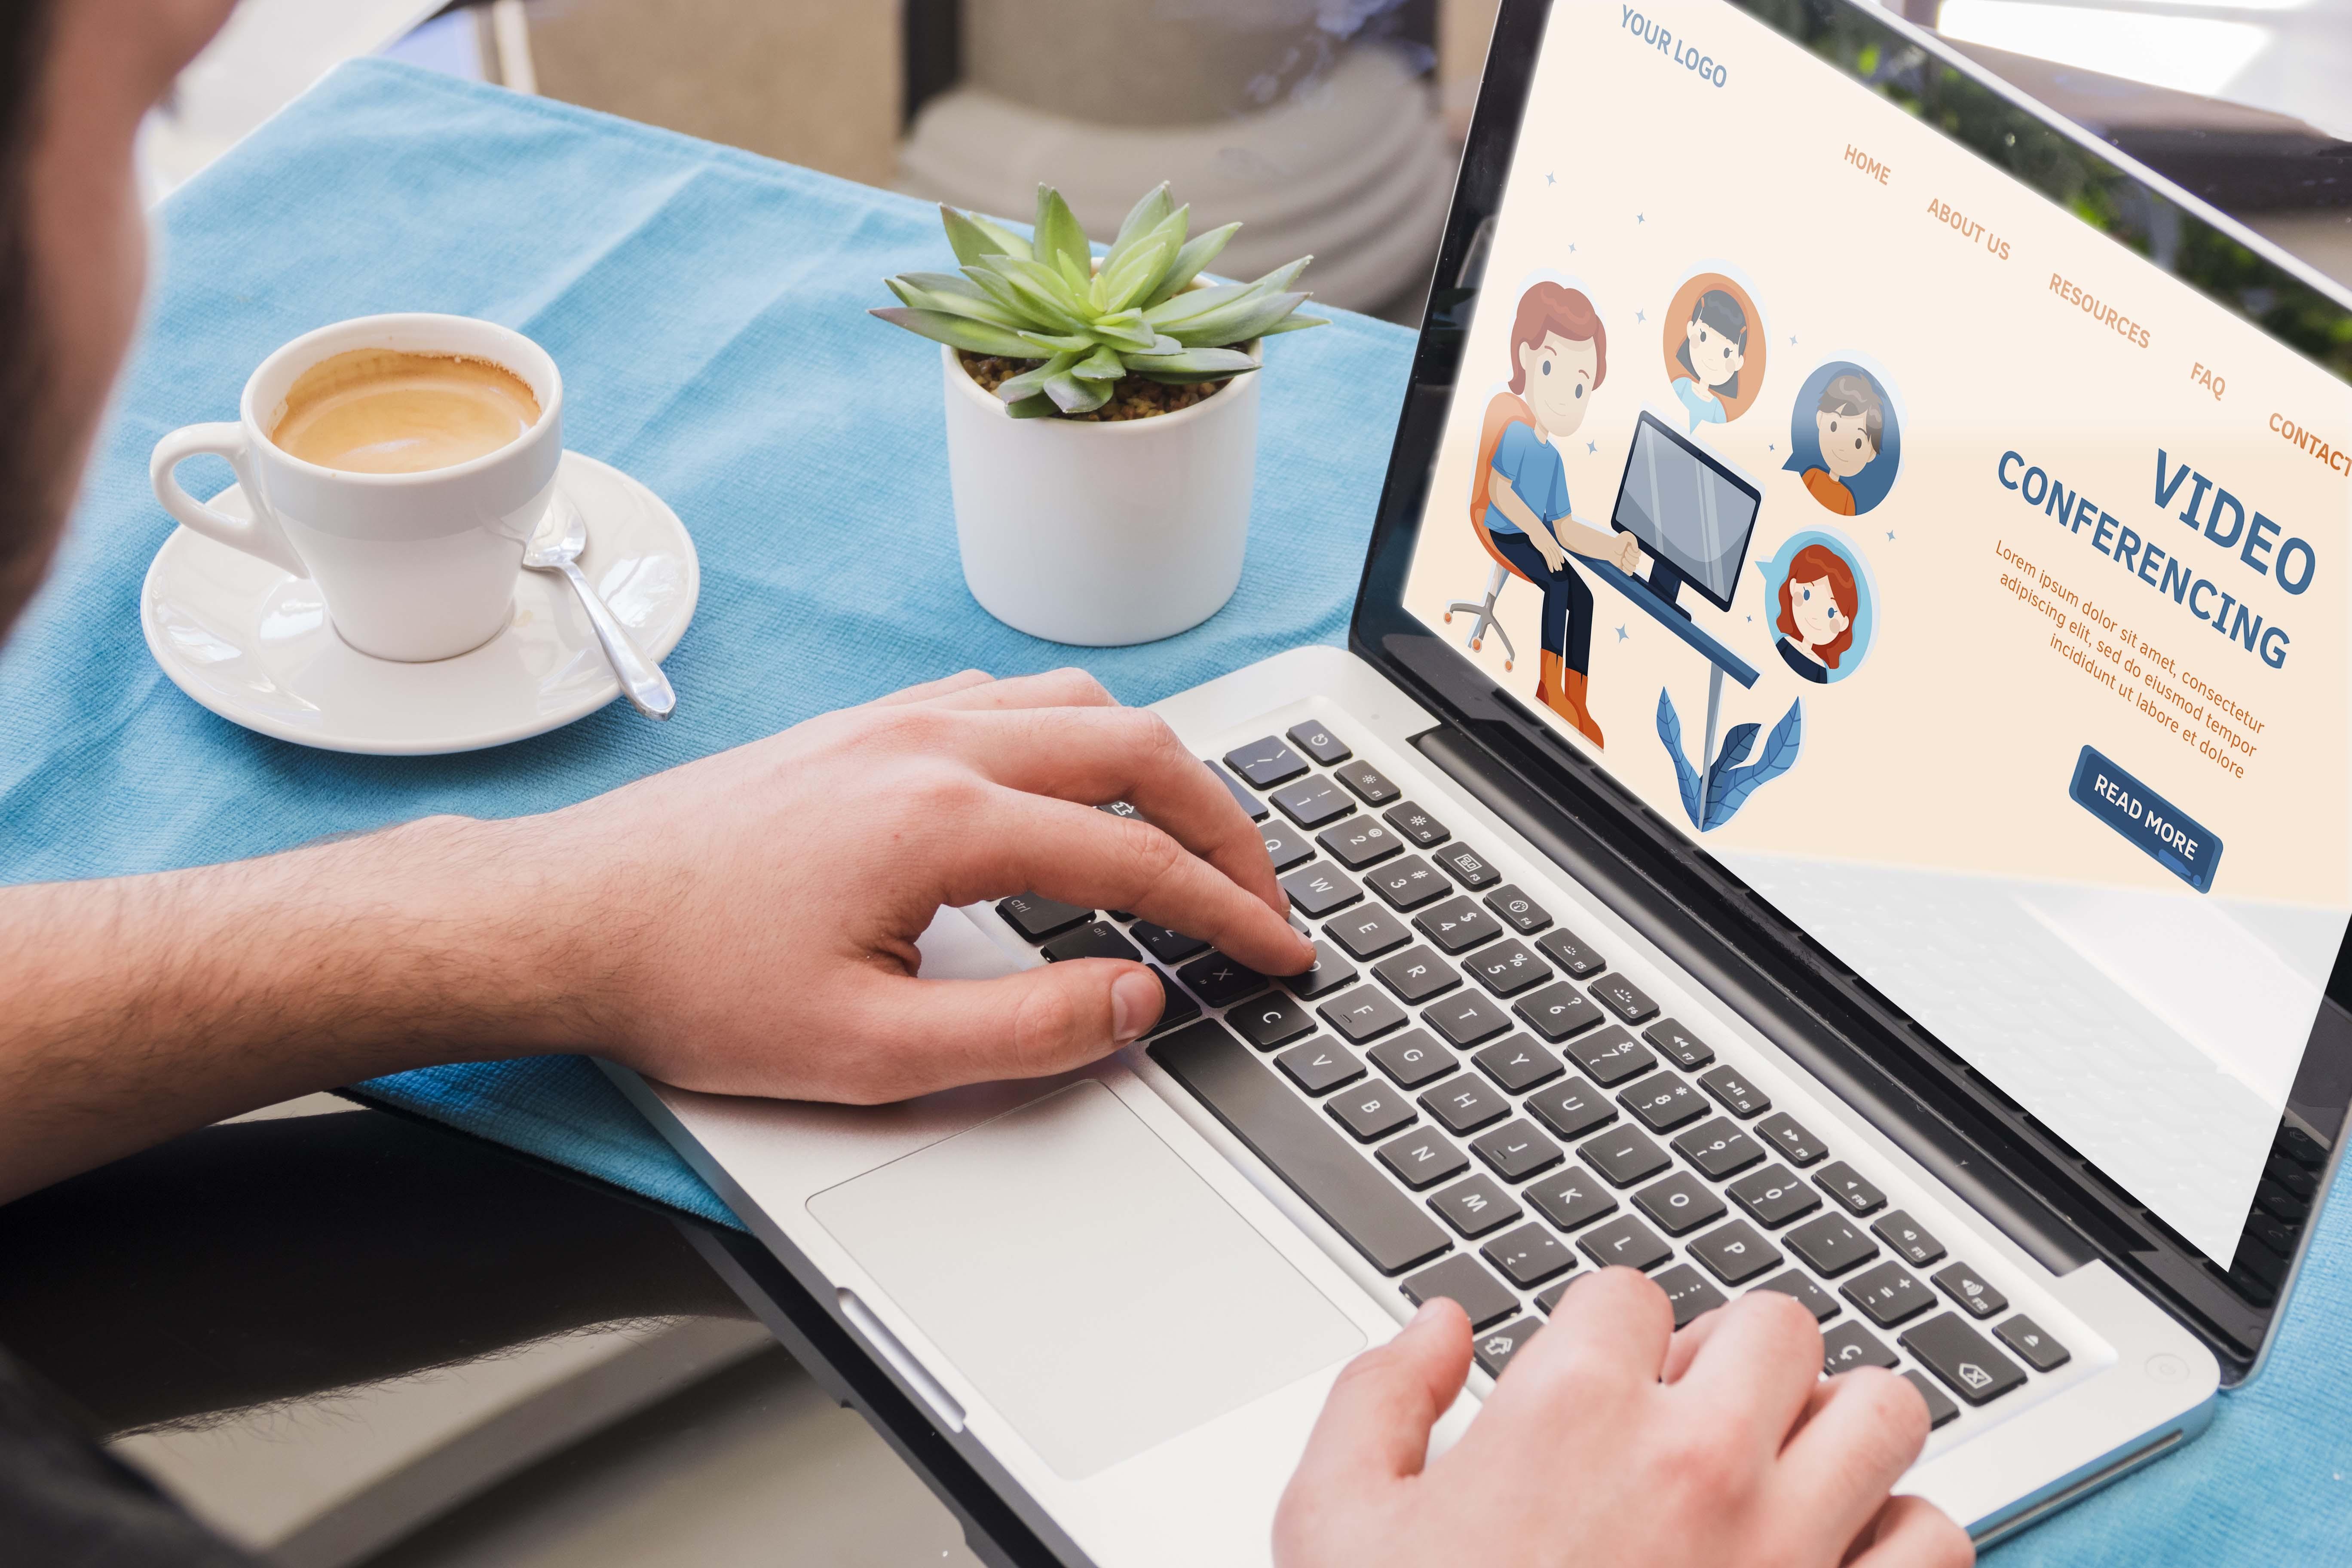 Langkah Aman dalam Penggunaan Aplikasi Konferensi Virtual